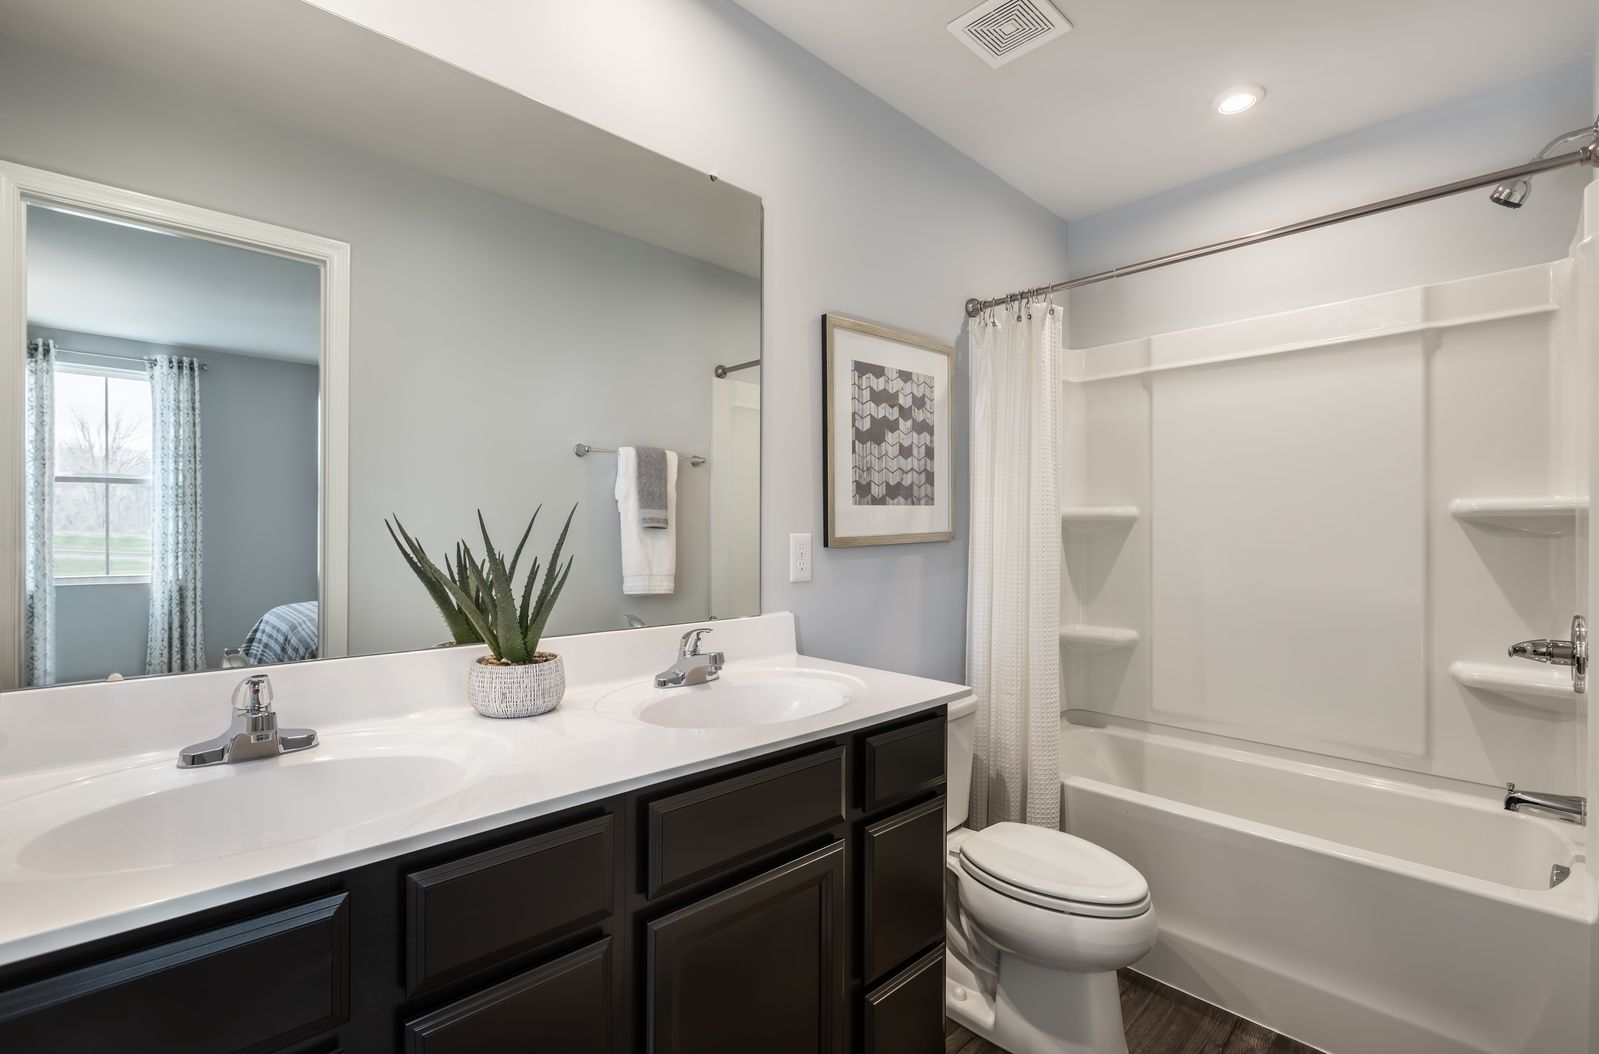 Bathroom featured in the Birch By Ryan Homes in Nashville, TN